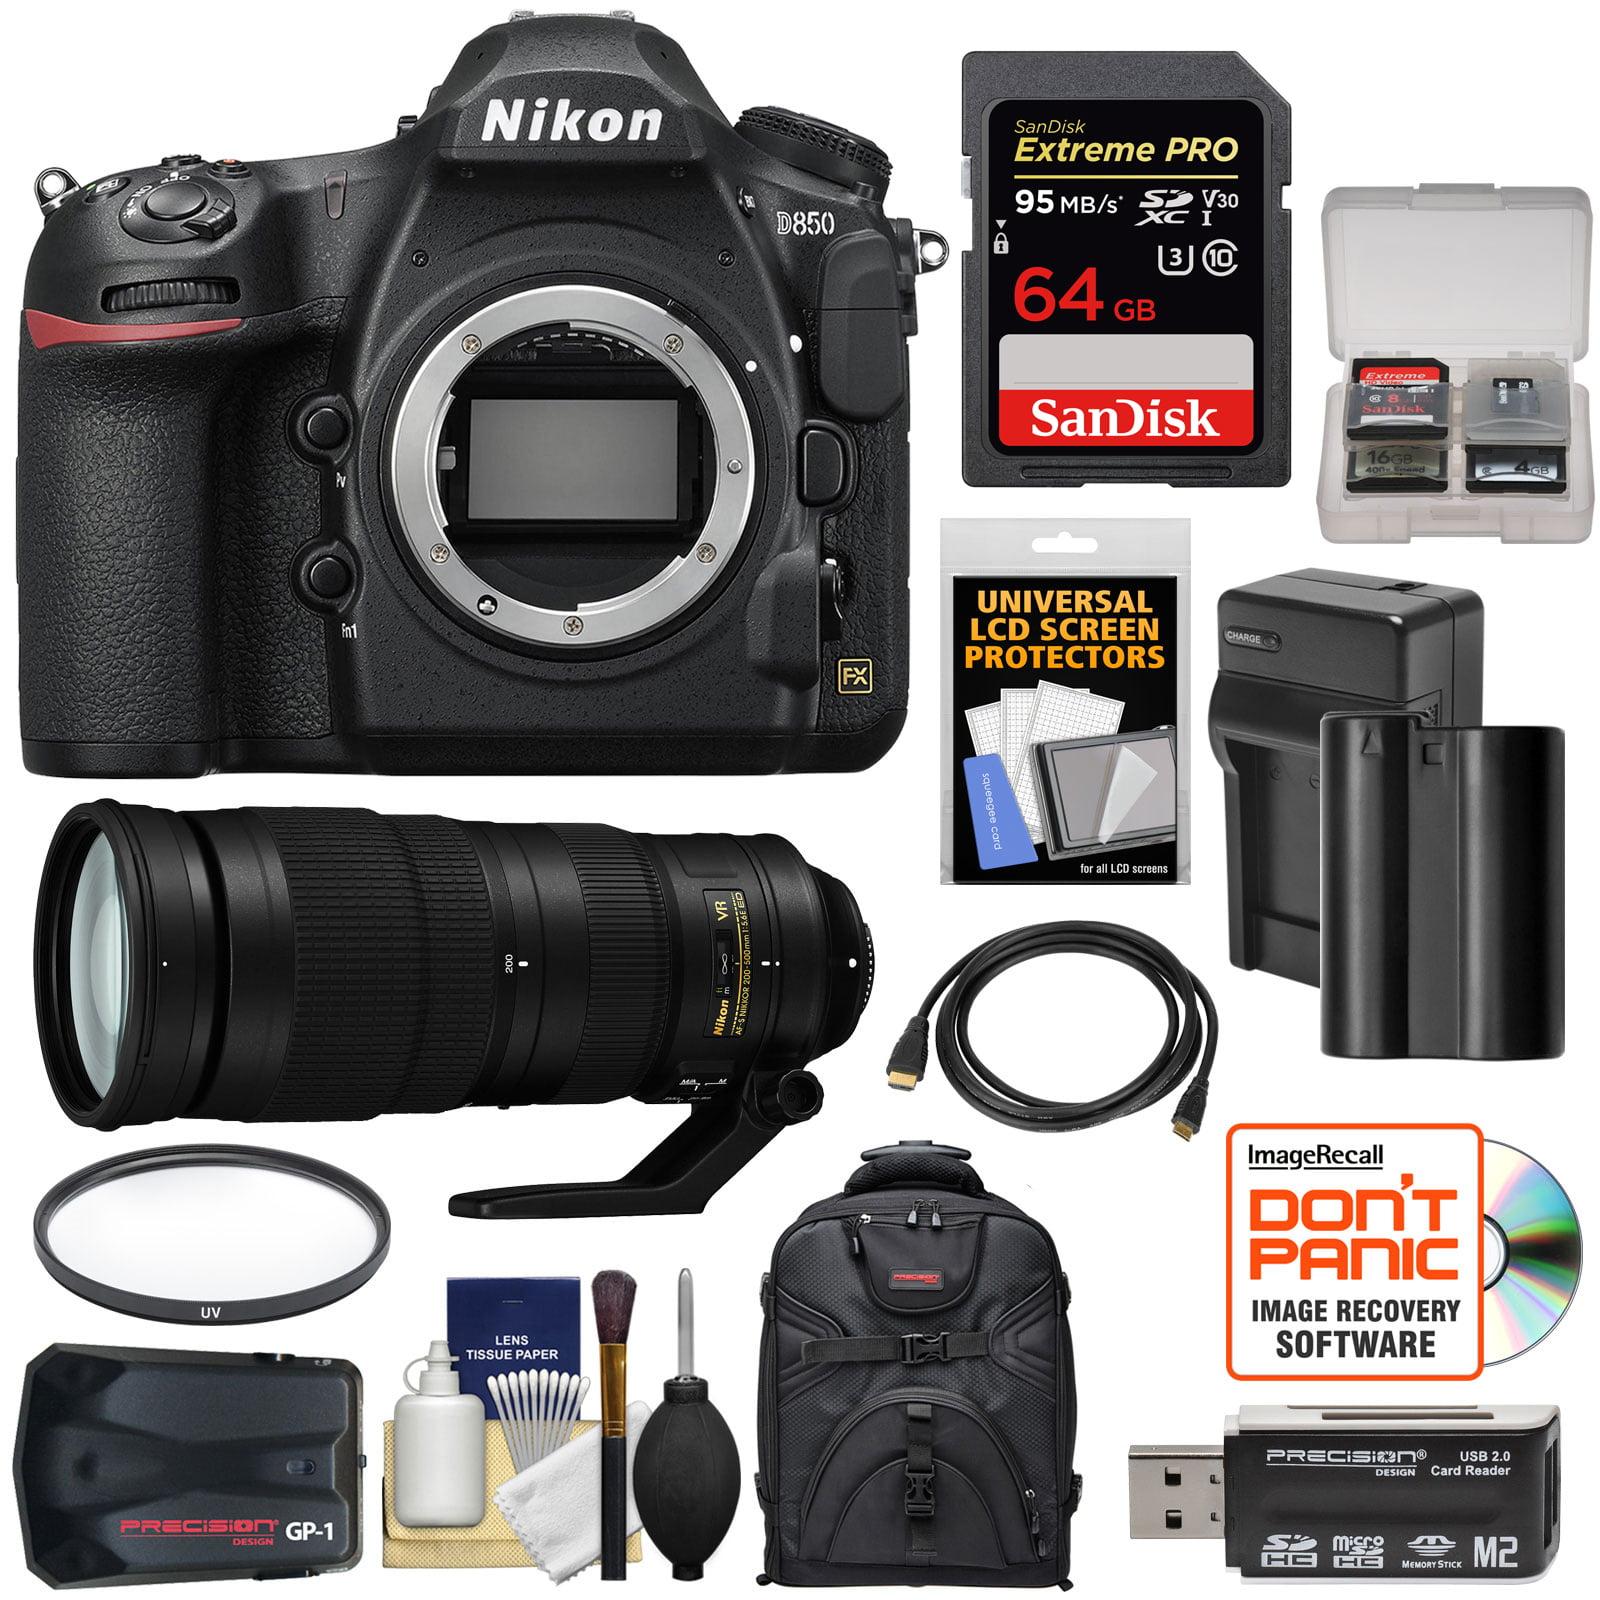 Nikon D850 Wi-Fi 4K Digital SLR Camera Body with 200-500mm f/5 6E VR Lens +  64GB Card + Battery + Charger + Backpack + GPS + Filter + Kit